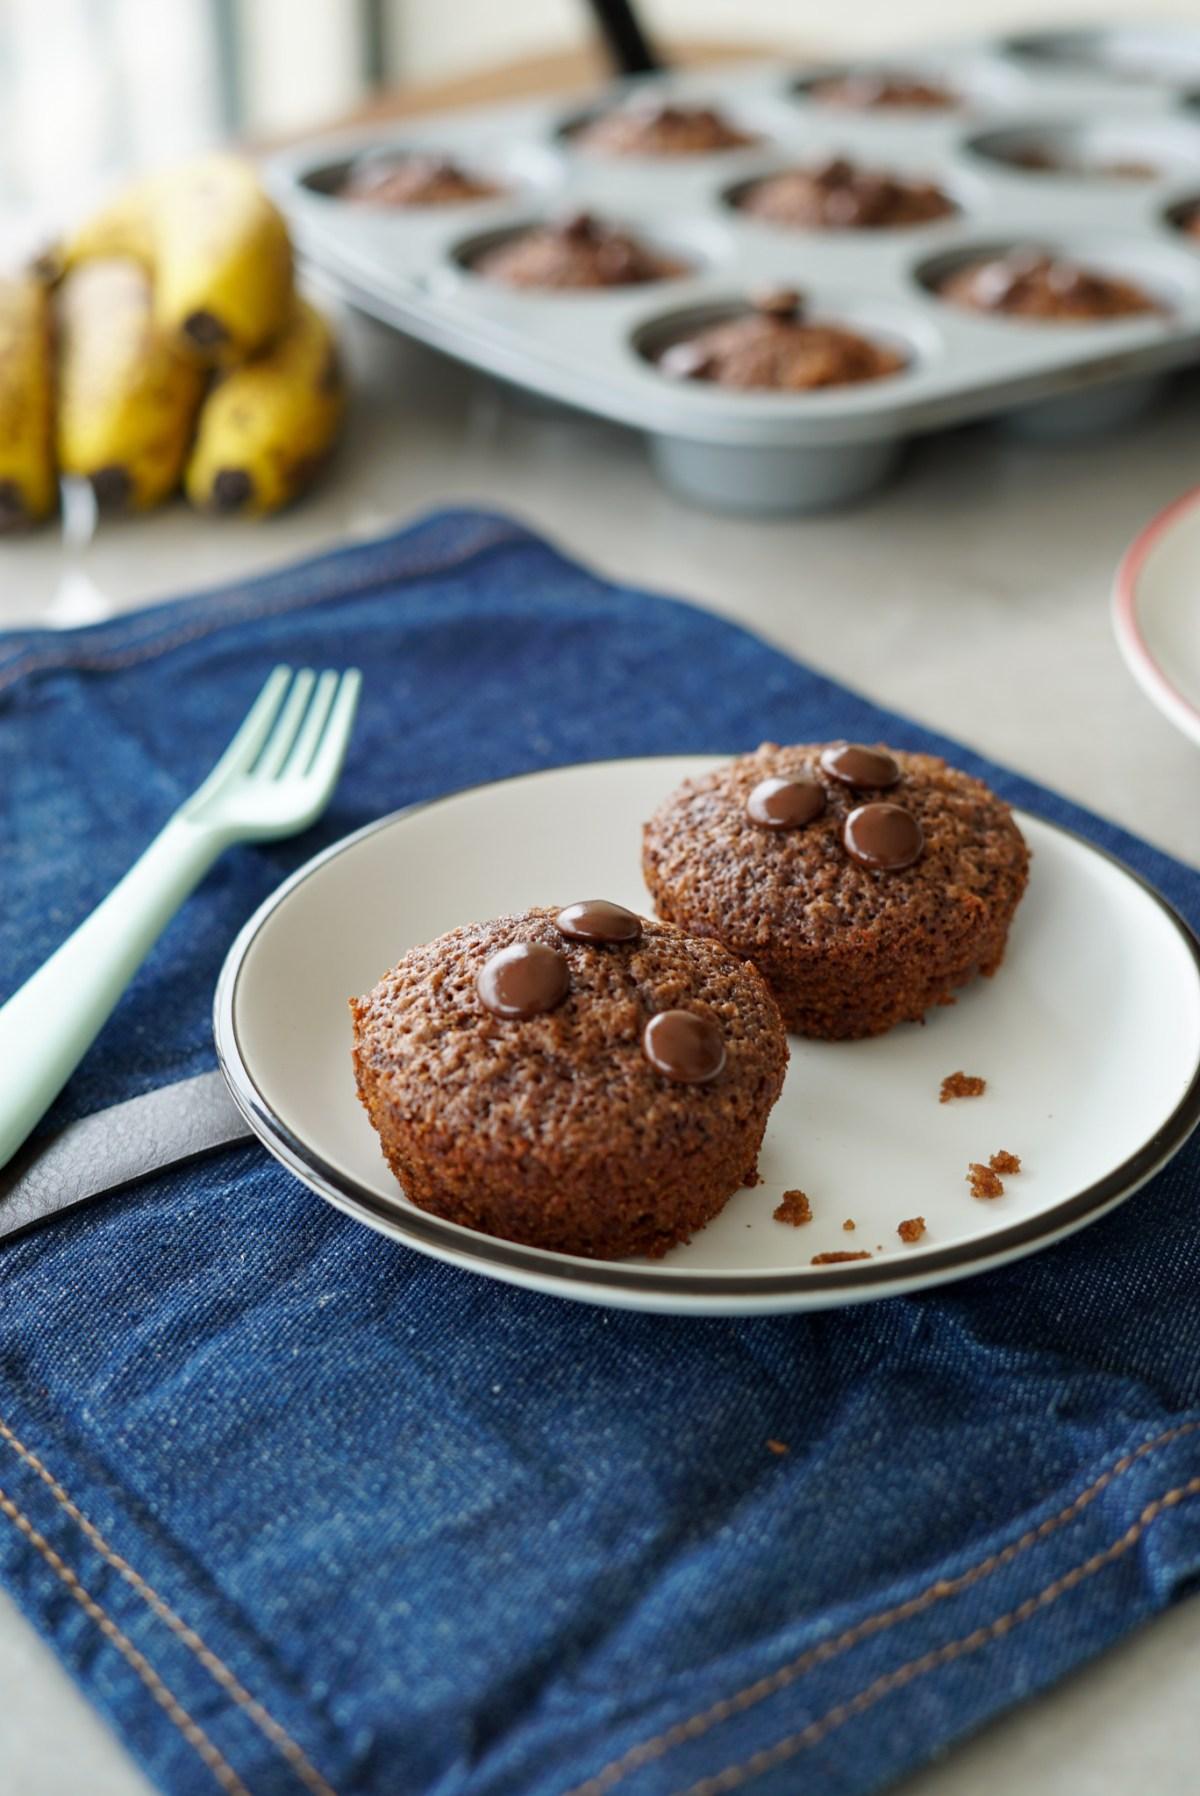 bolo de banana com chocolate - receita fácil para a lancheira